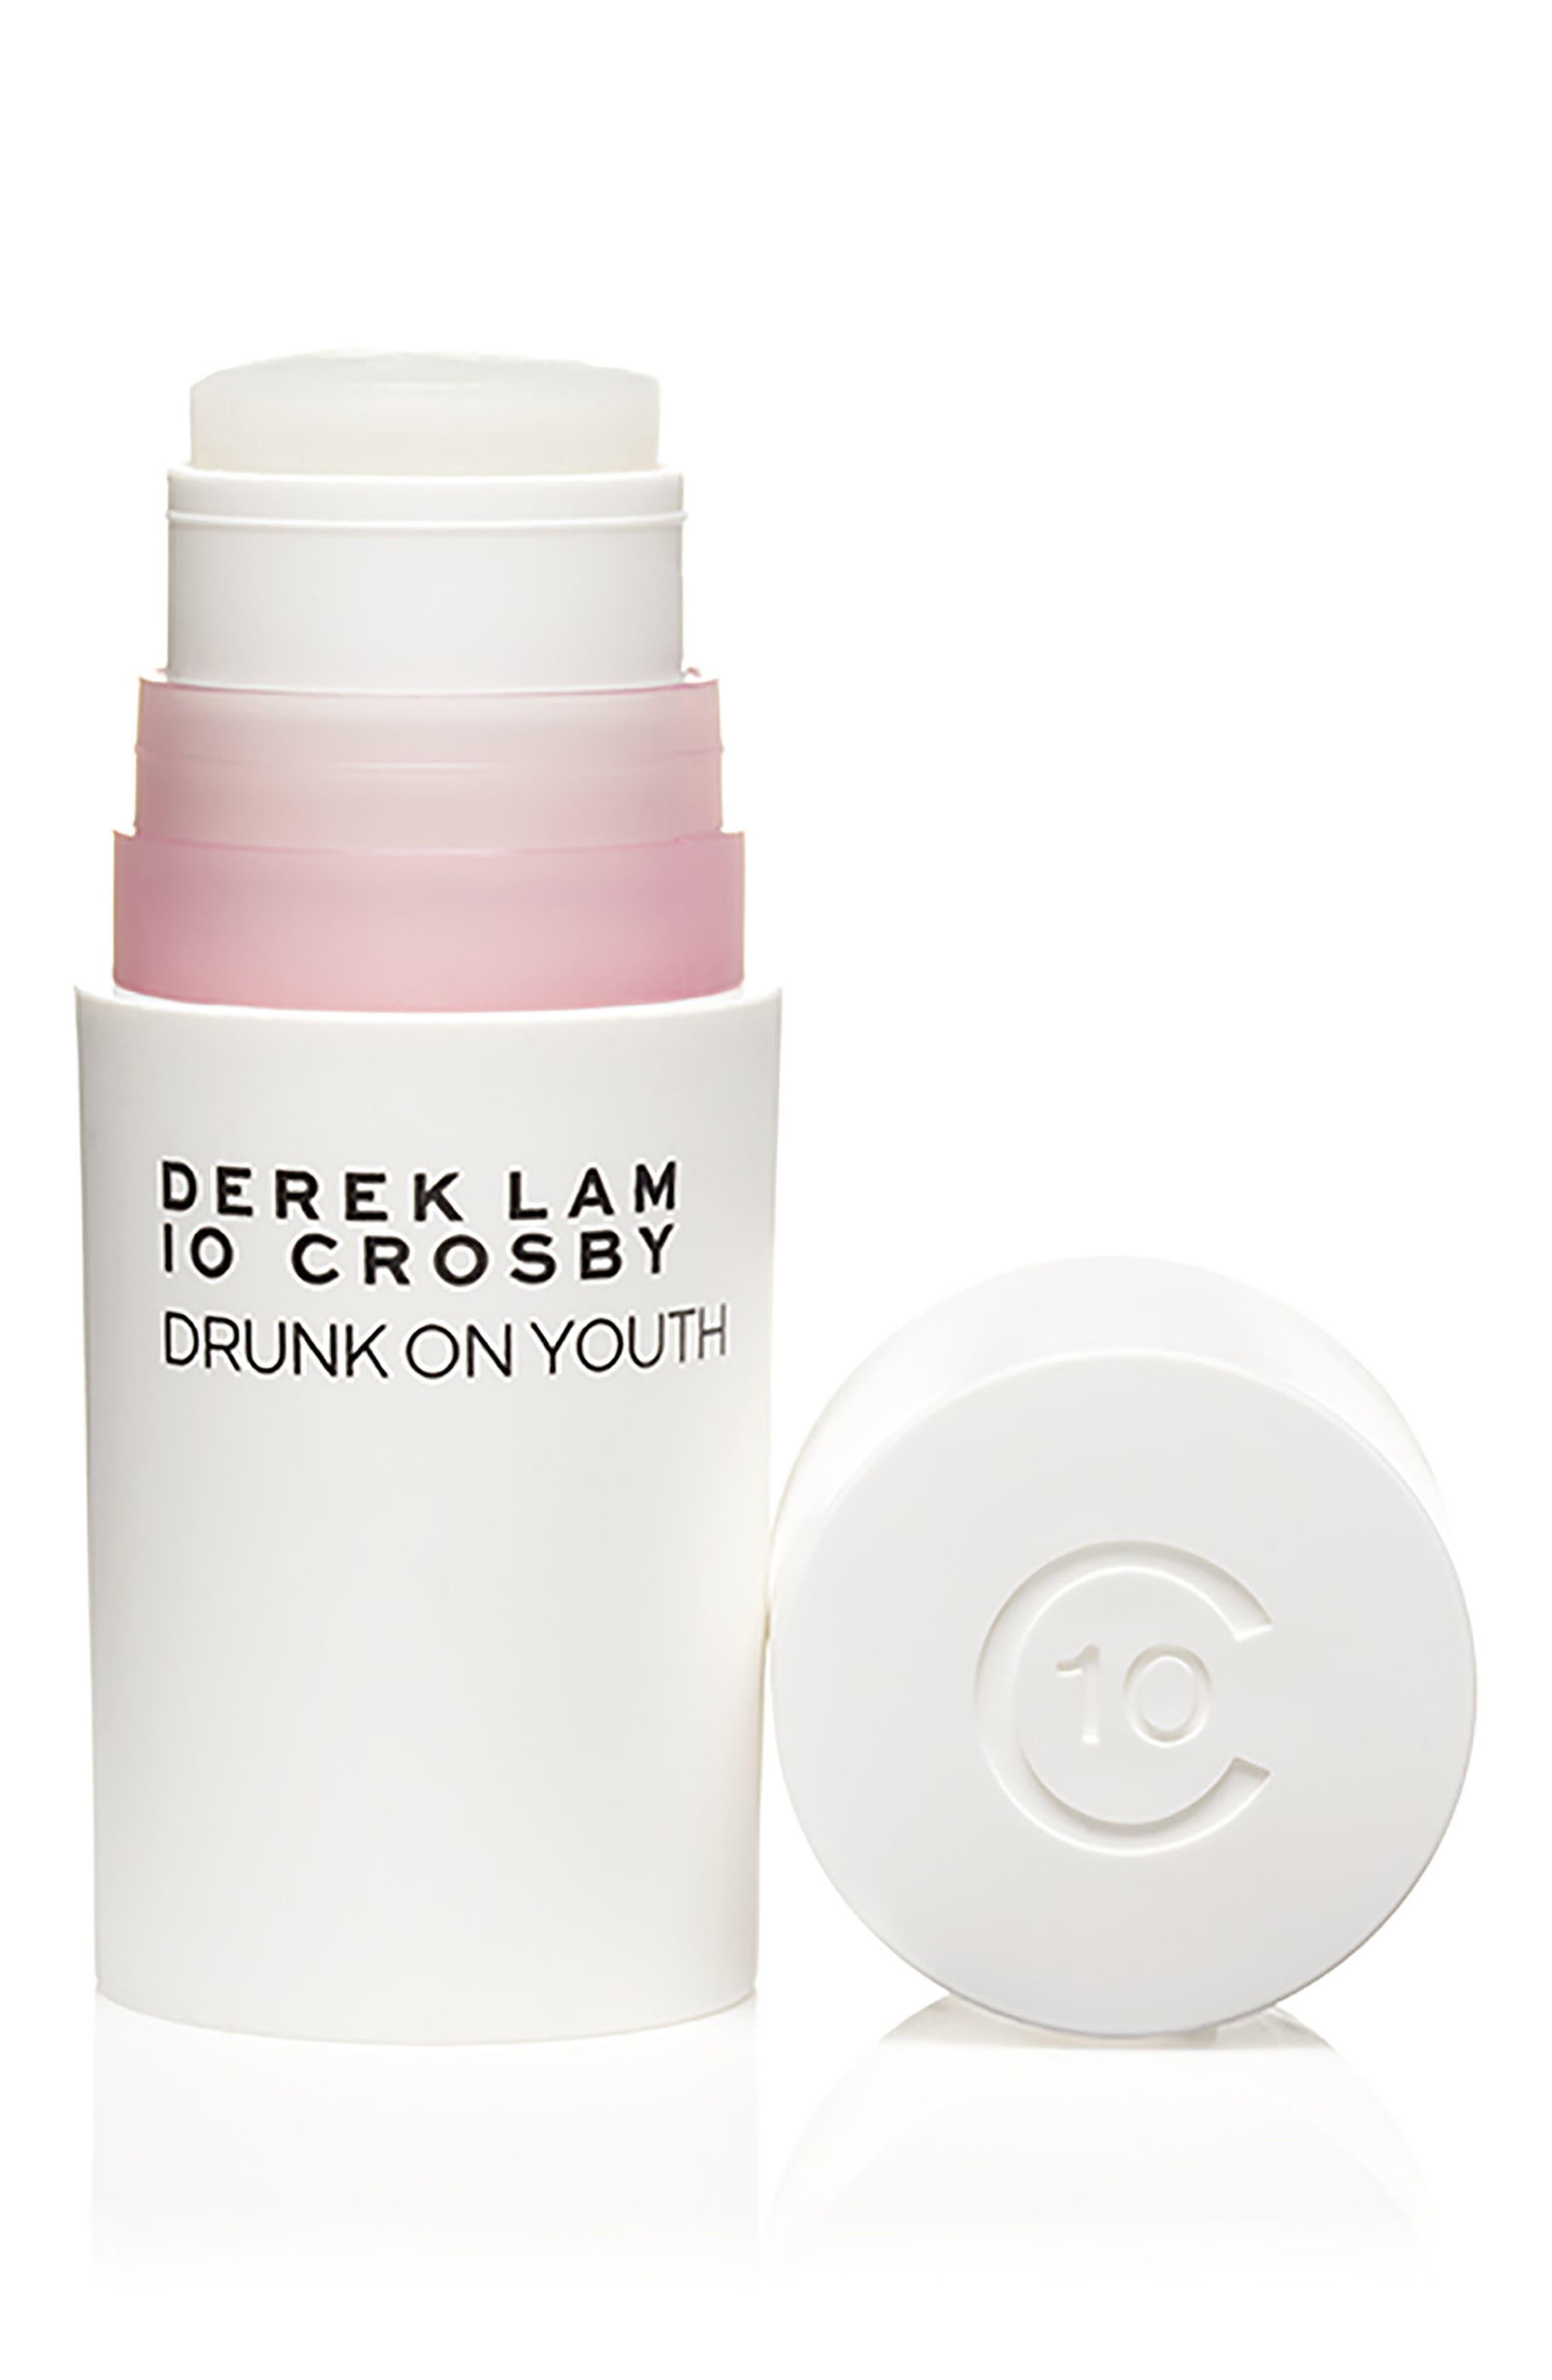 Drunk on Youth Parfum Stick,                             Main thumbnail 1, color,                             No Color